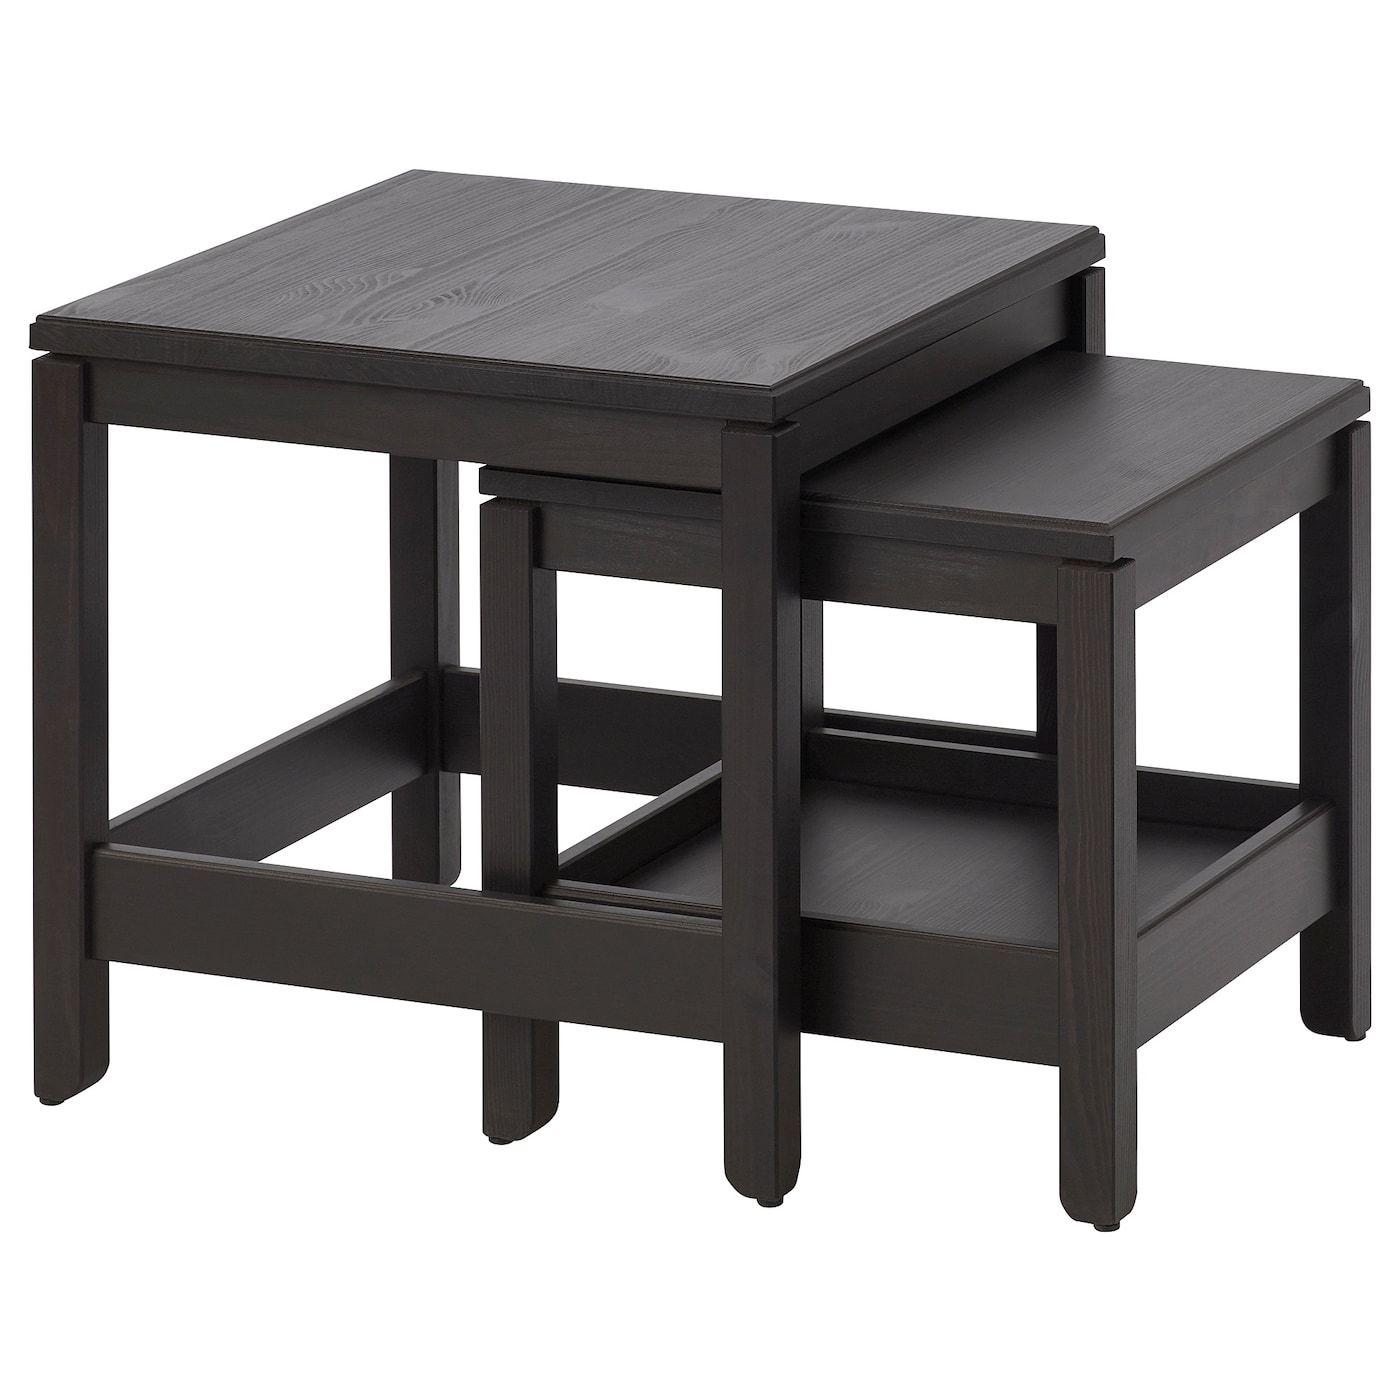 Ikea Salontafel Rond Zwart.Havsta Bijzettafel Set Van 2 Donkerbruin